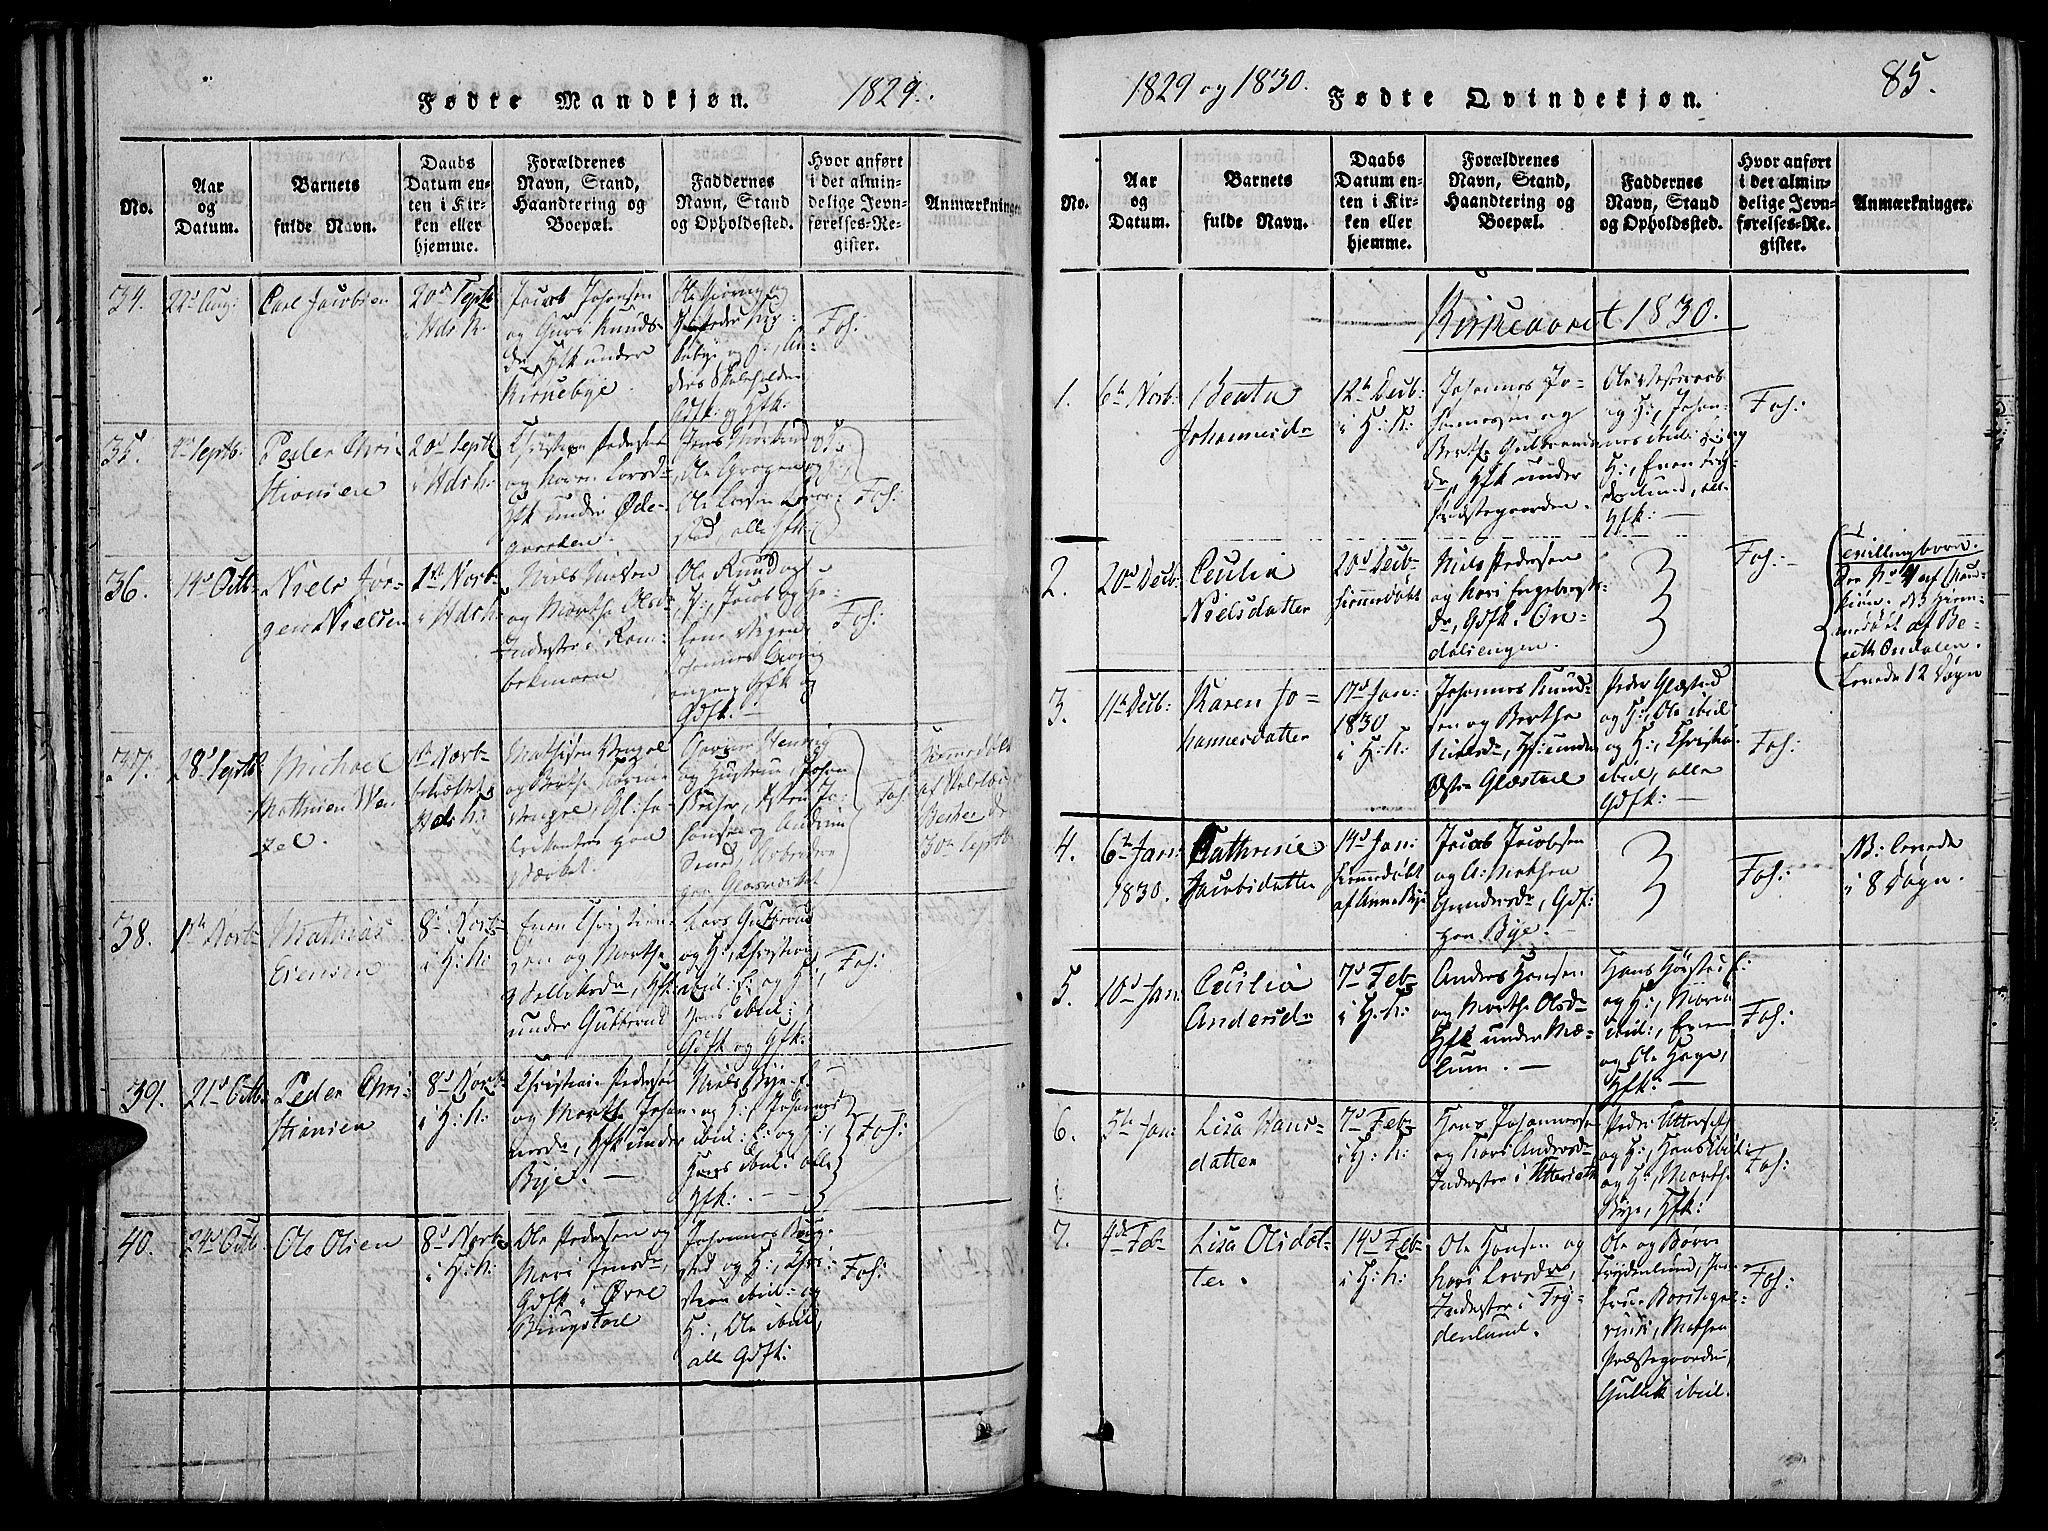 SAH, Vardal prestekontor, H/Ha/Haa/L0004: Ministerialbok nr. 4, 1814-1831, s. 85